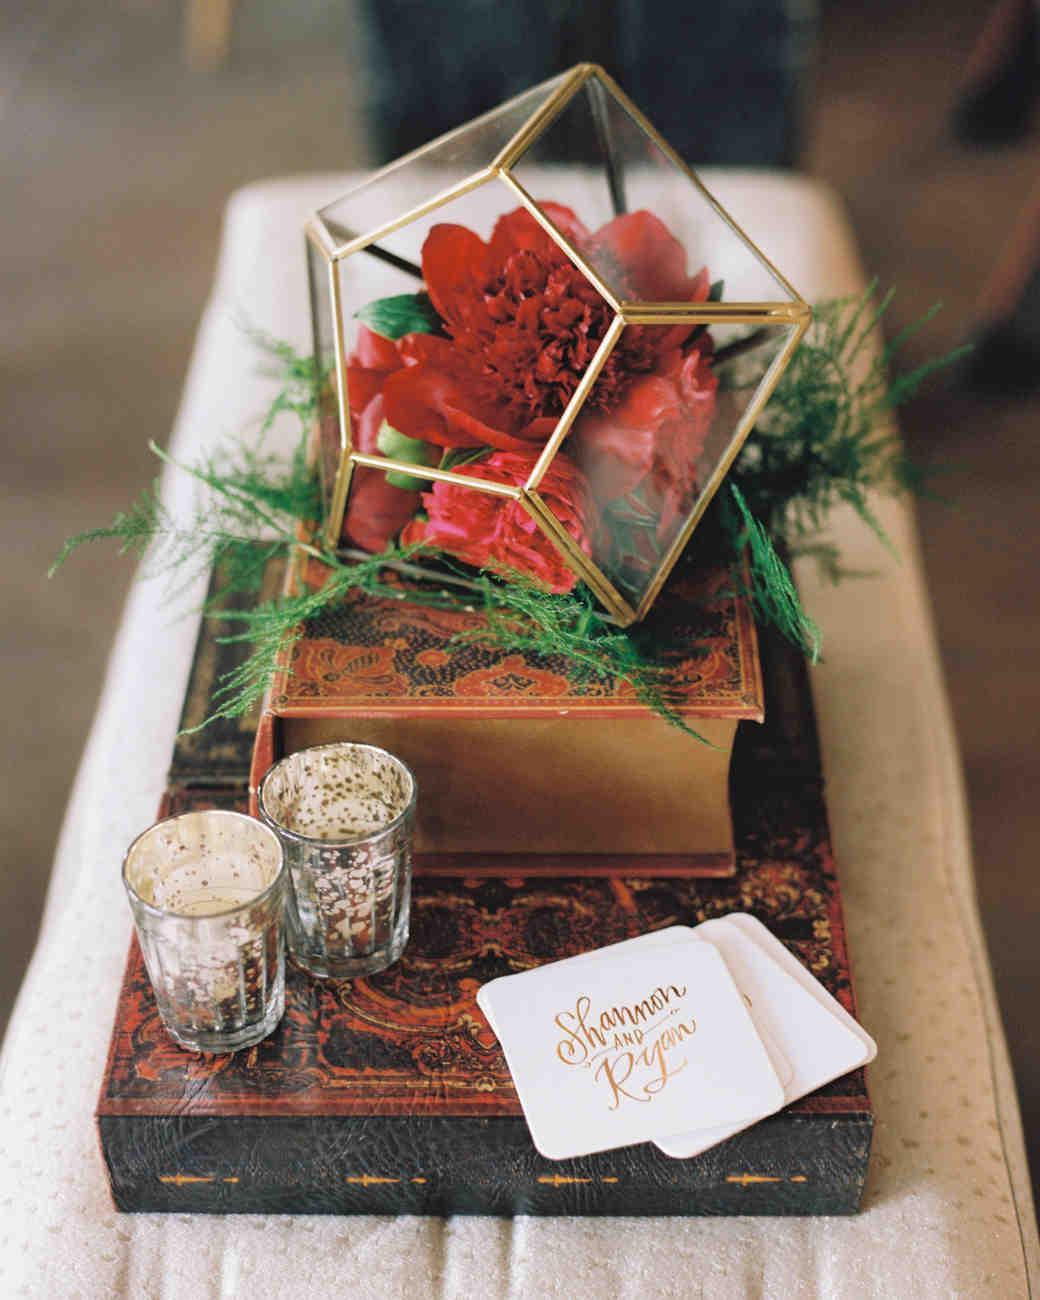 shannon-ryan-wedding-coasters-333-s111853-0415.jpg